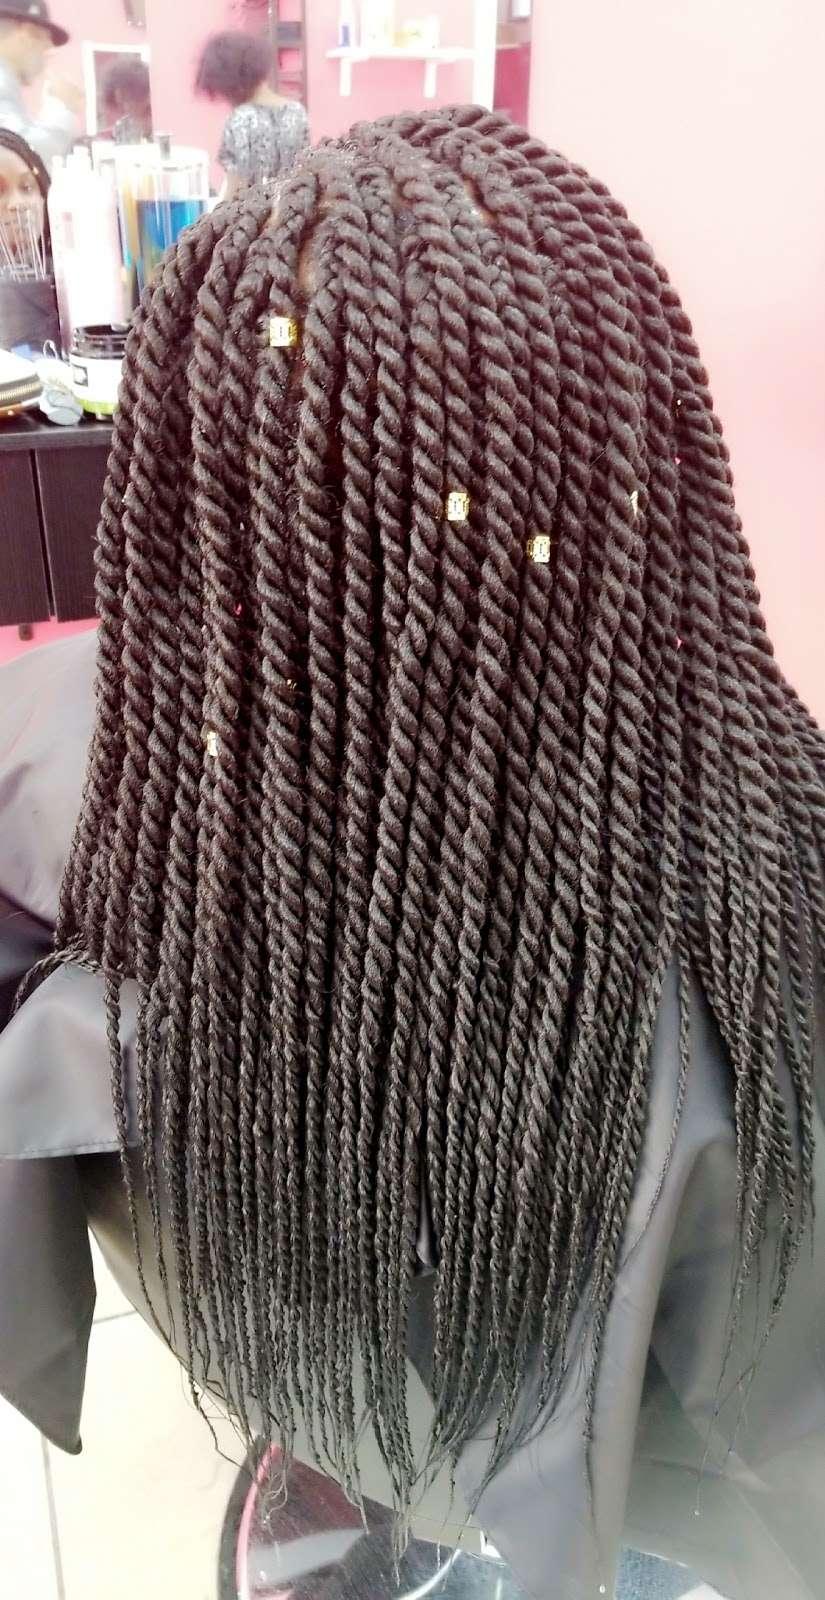 Mama African Hair Braiding - hair care  | Photo 1 of 10 | Address: 162 Rockaway Ave, Brooklyn, NY 11233, USA | Phone: (718) 635-1543